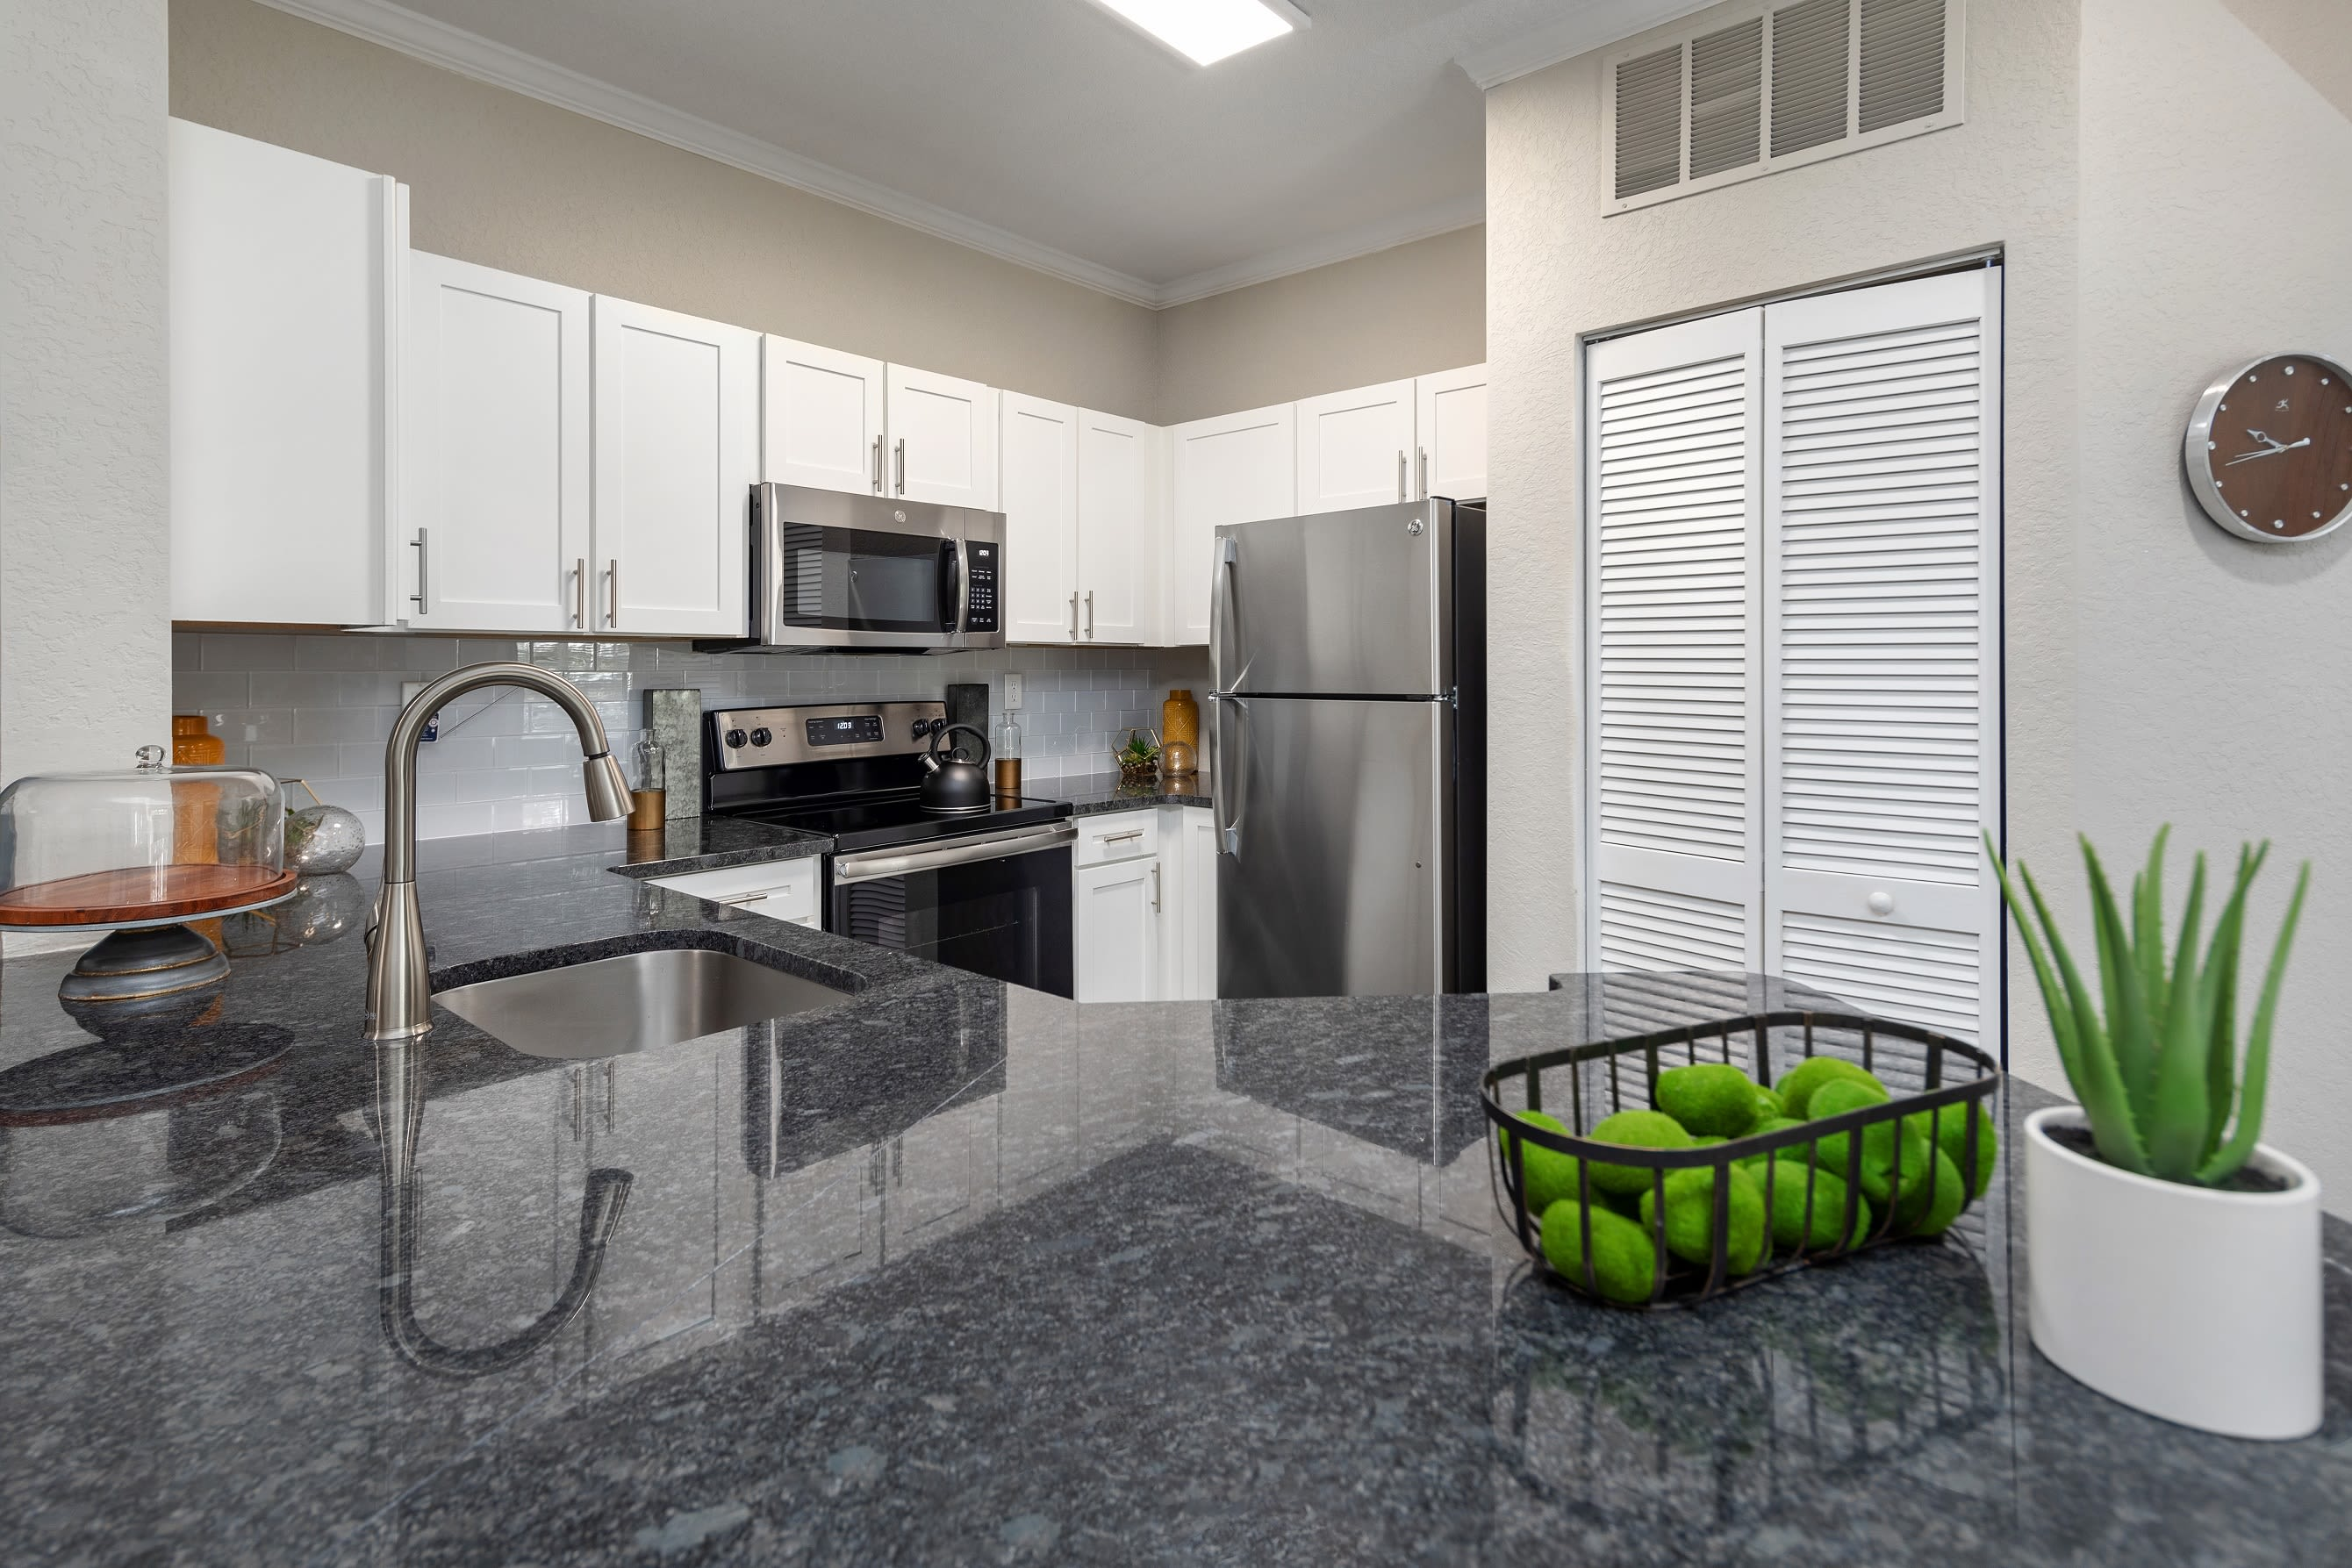 Modern open kitchen with granite countertops at Mezza in Jacksonville, Florida